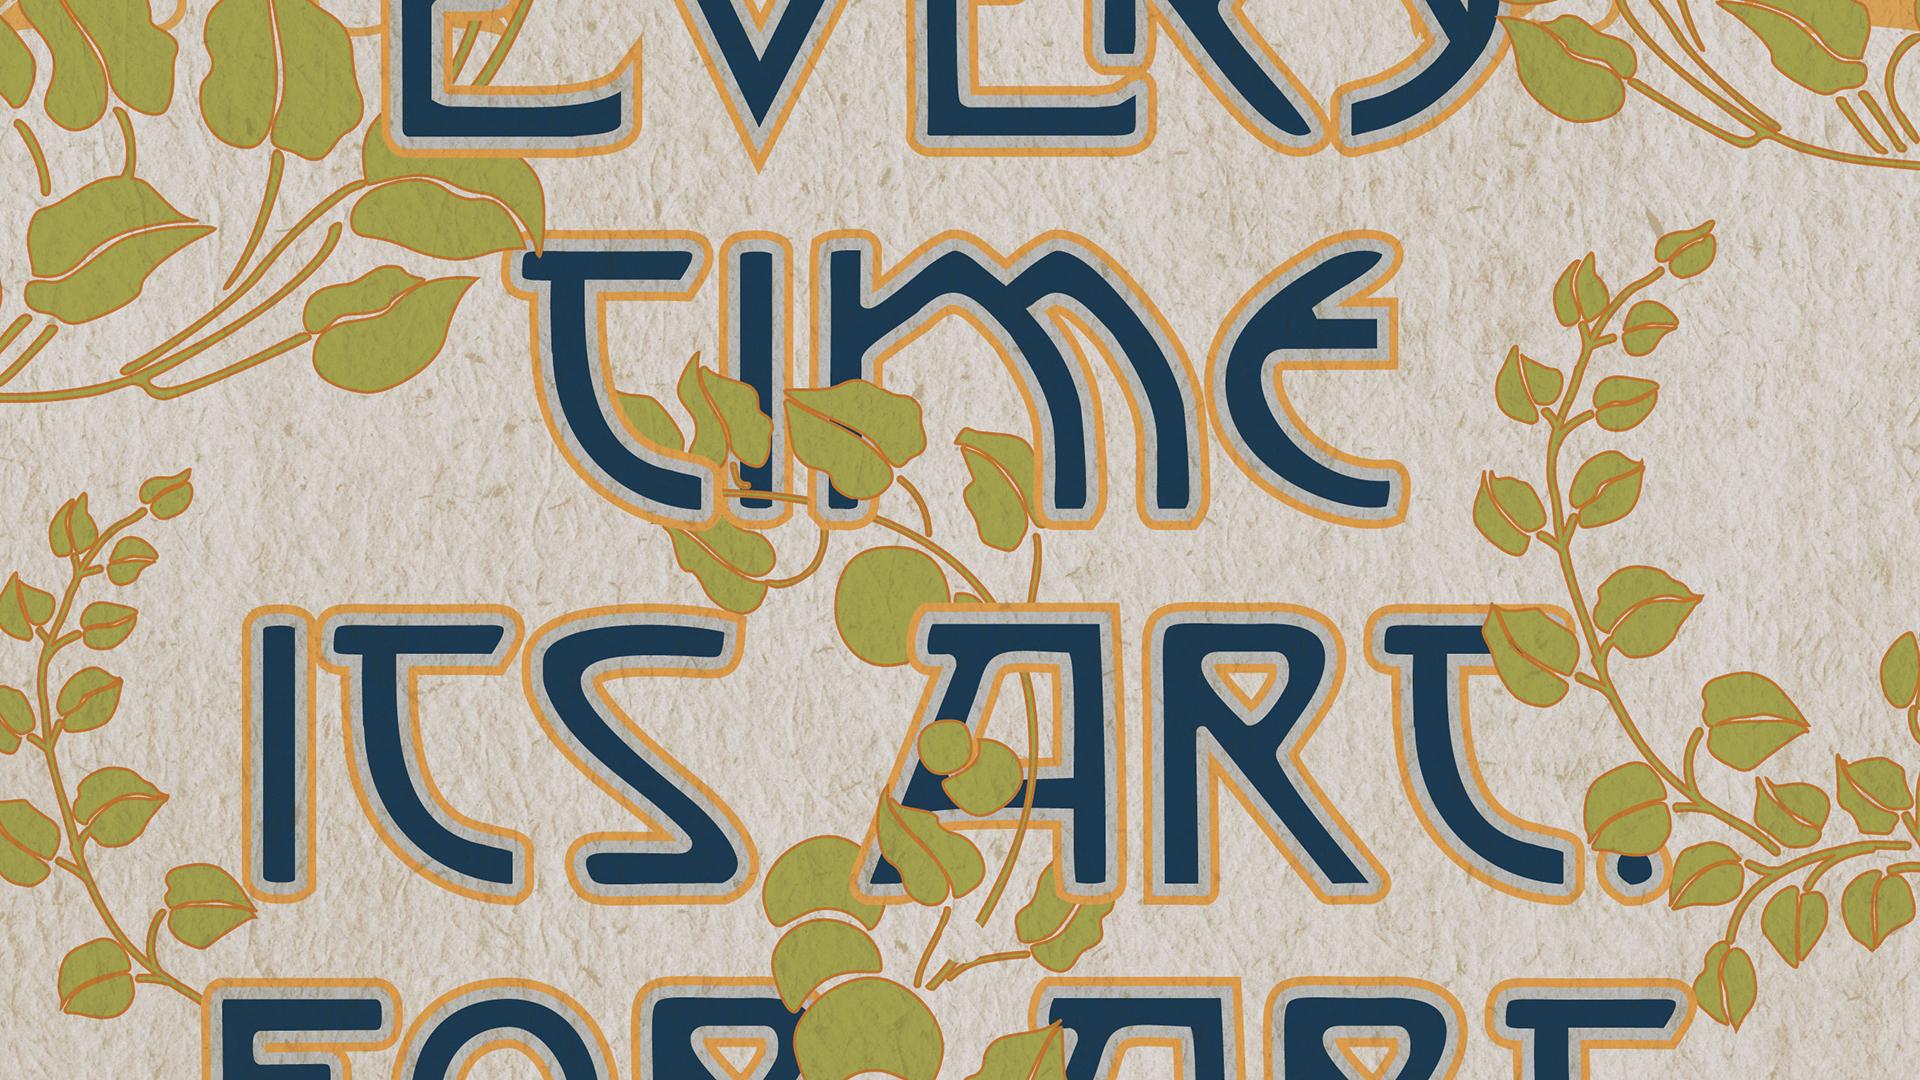 designing a typographic art nouveau poster